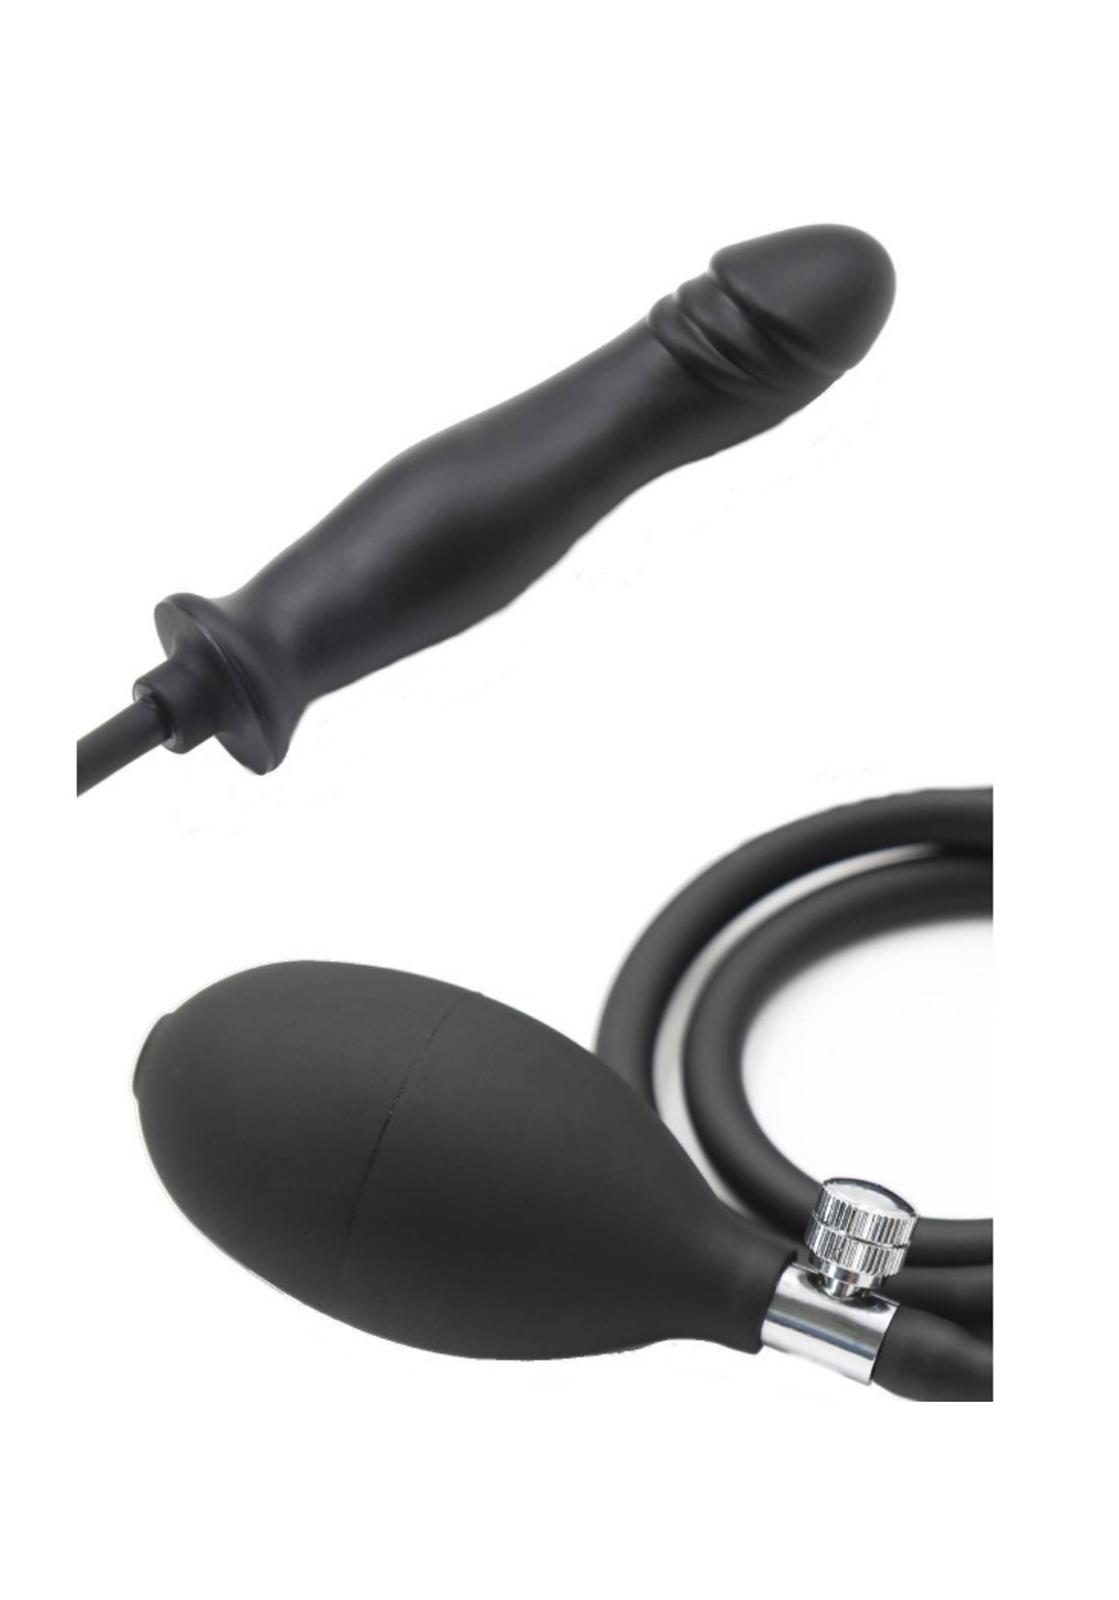 Rude Rider: Inflatable Dildo | Black